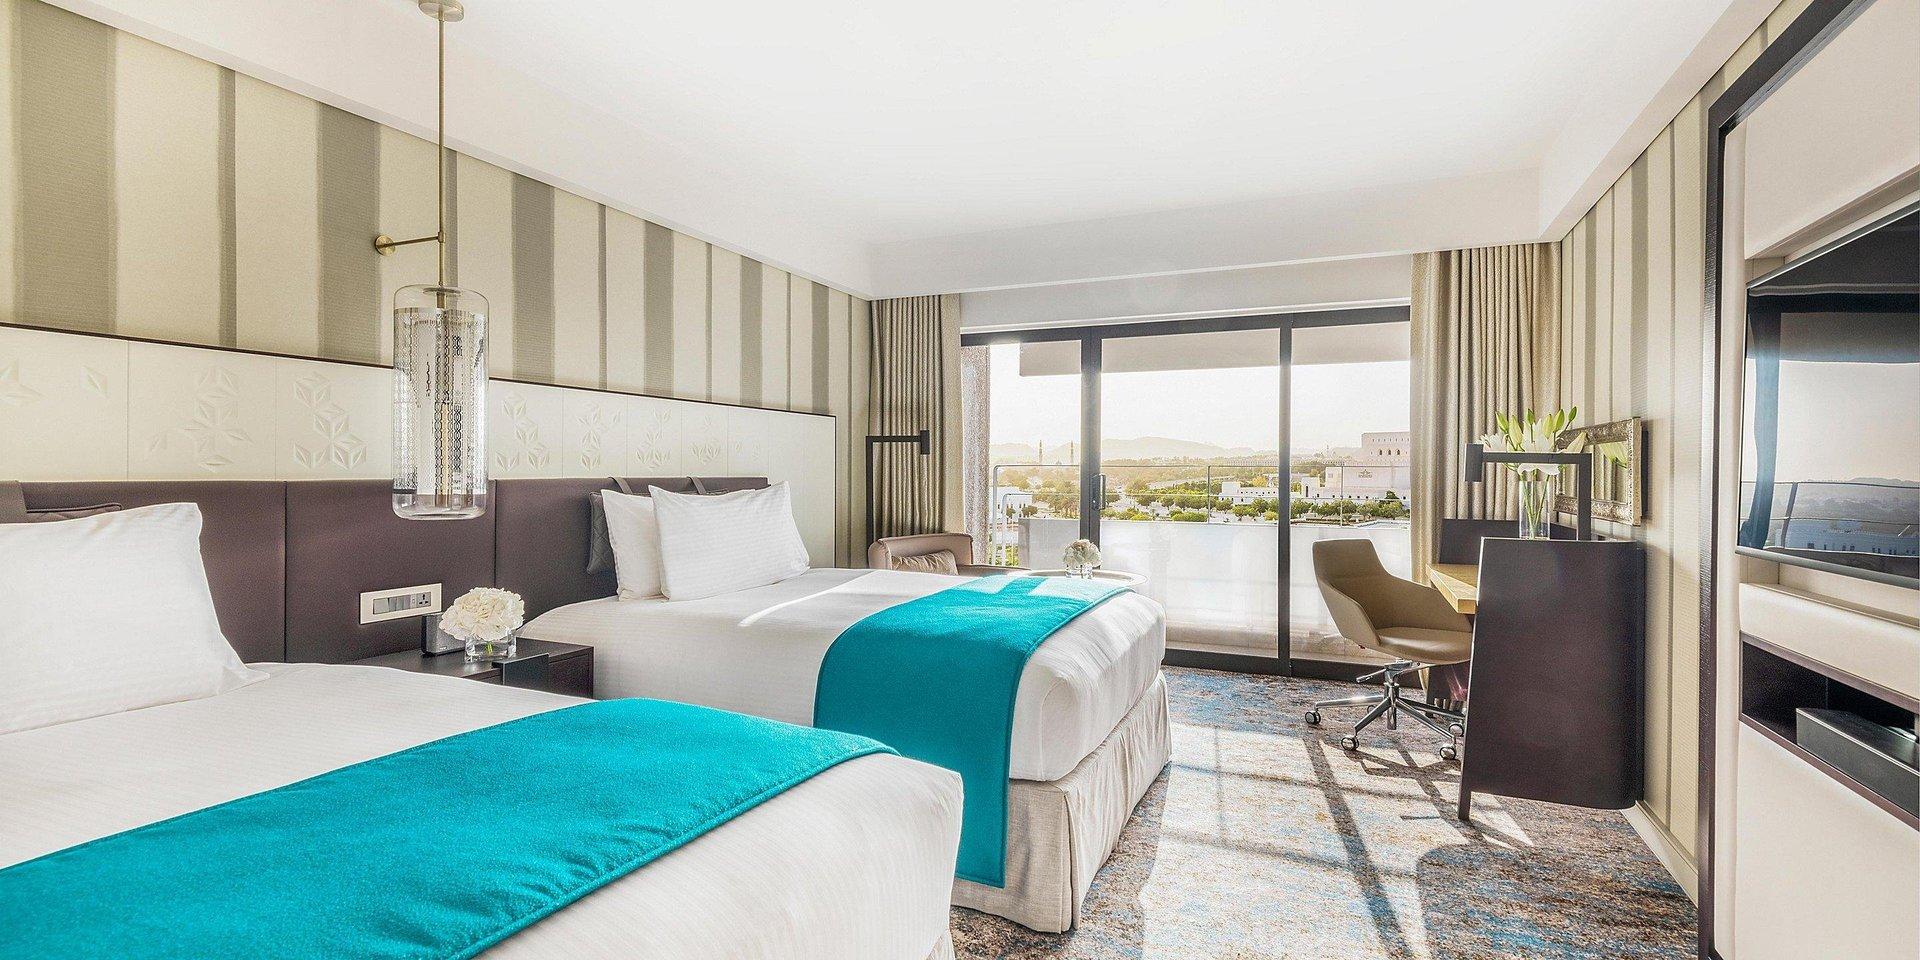 Hotel Intercontinental Muscat kamer - Muscat